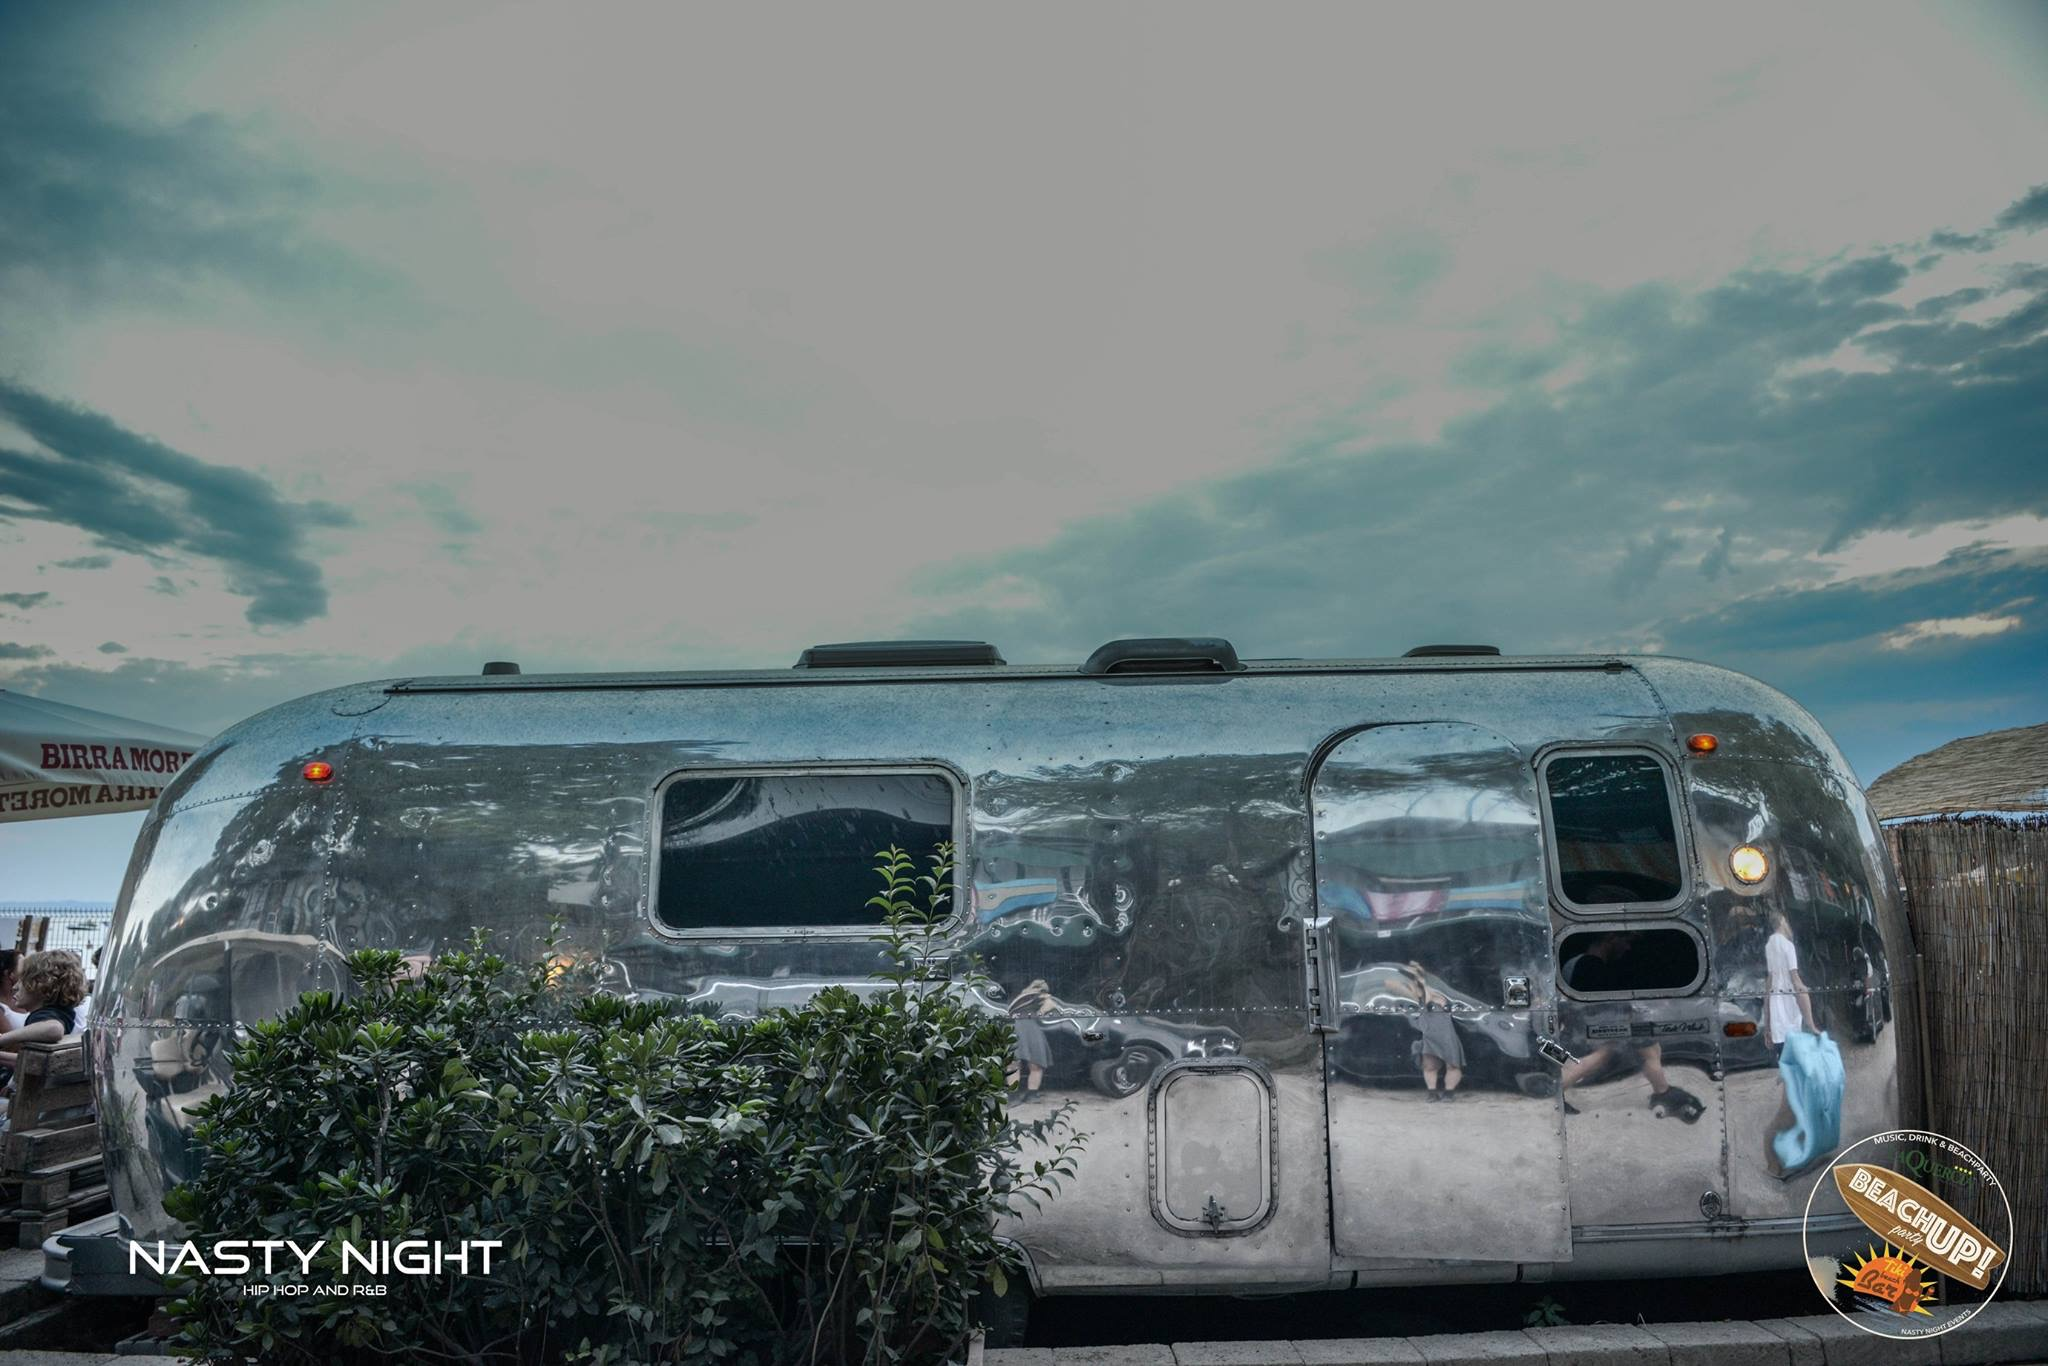 Airstream 24 feet bar by Officine Vivald